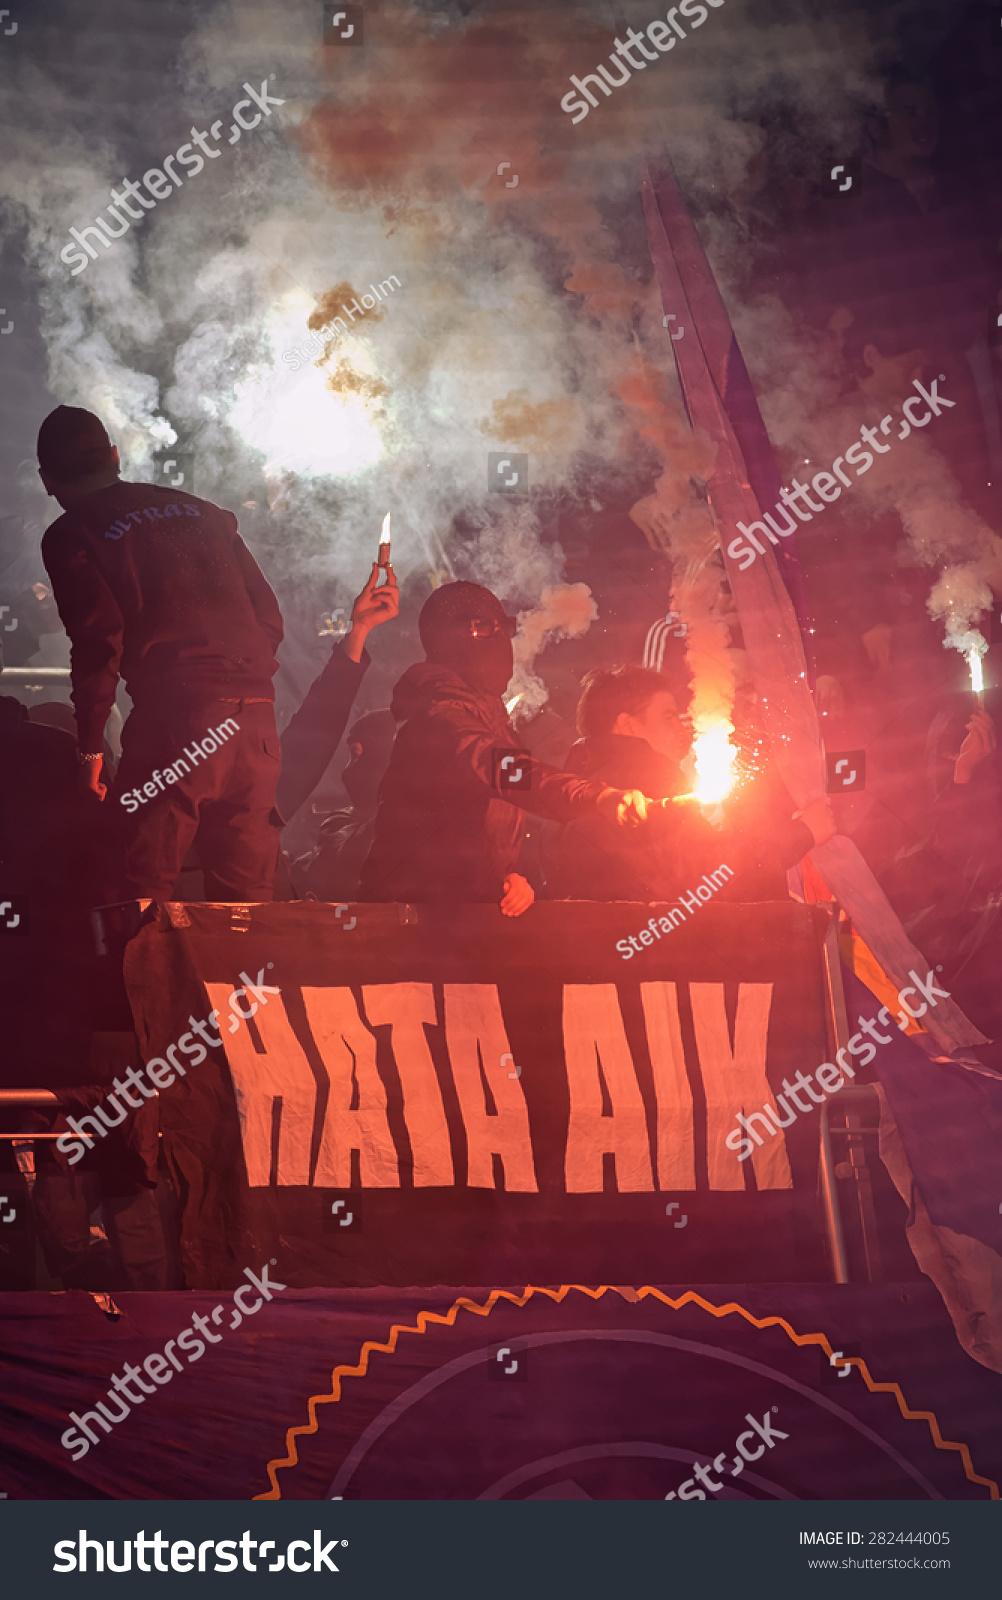 Stockholm Sweden May 25 Ultras Masked People Stock Image 282444005